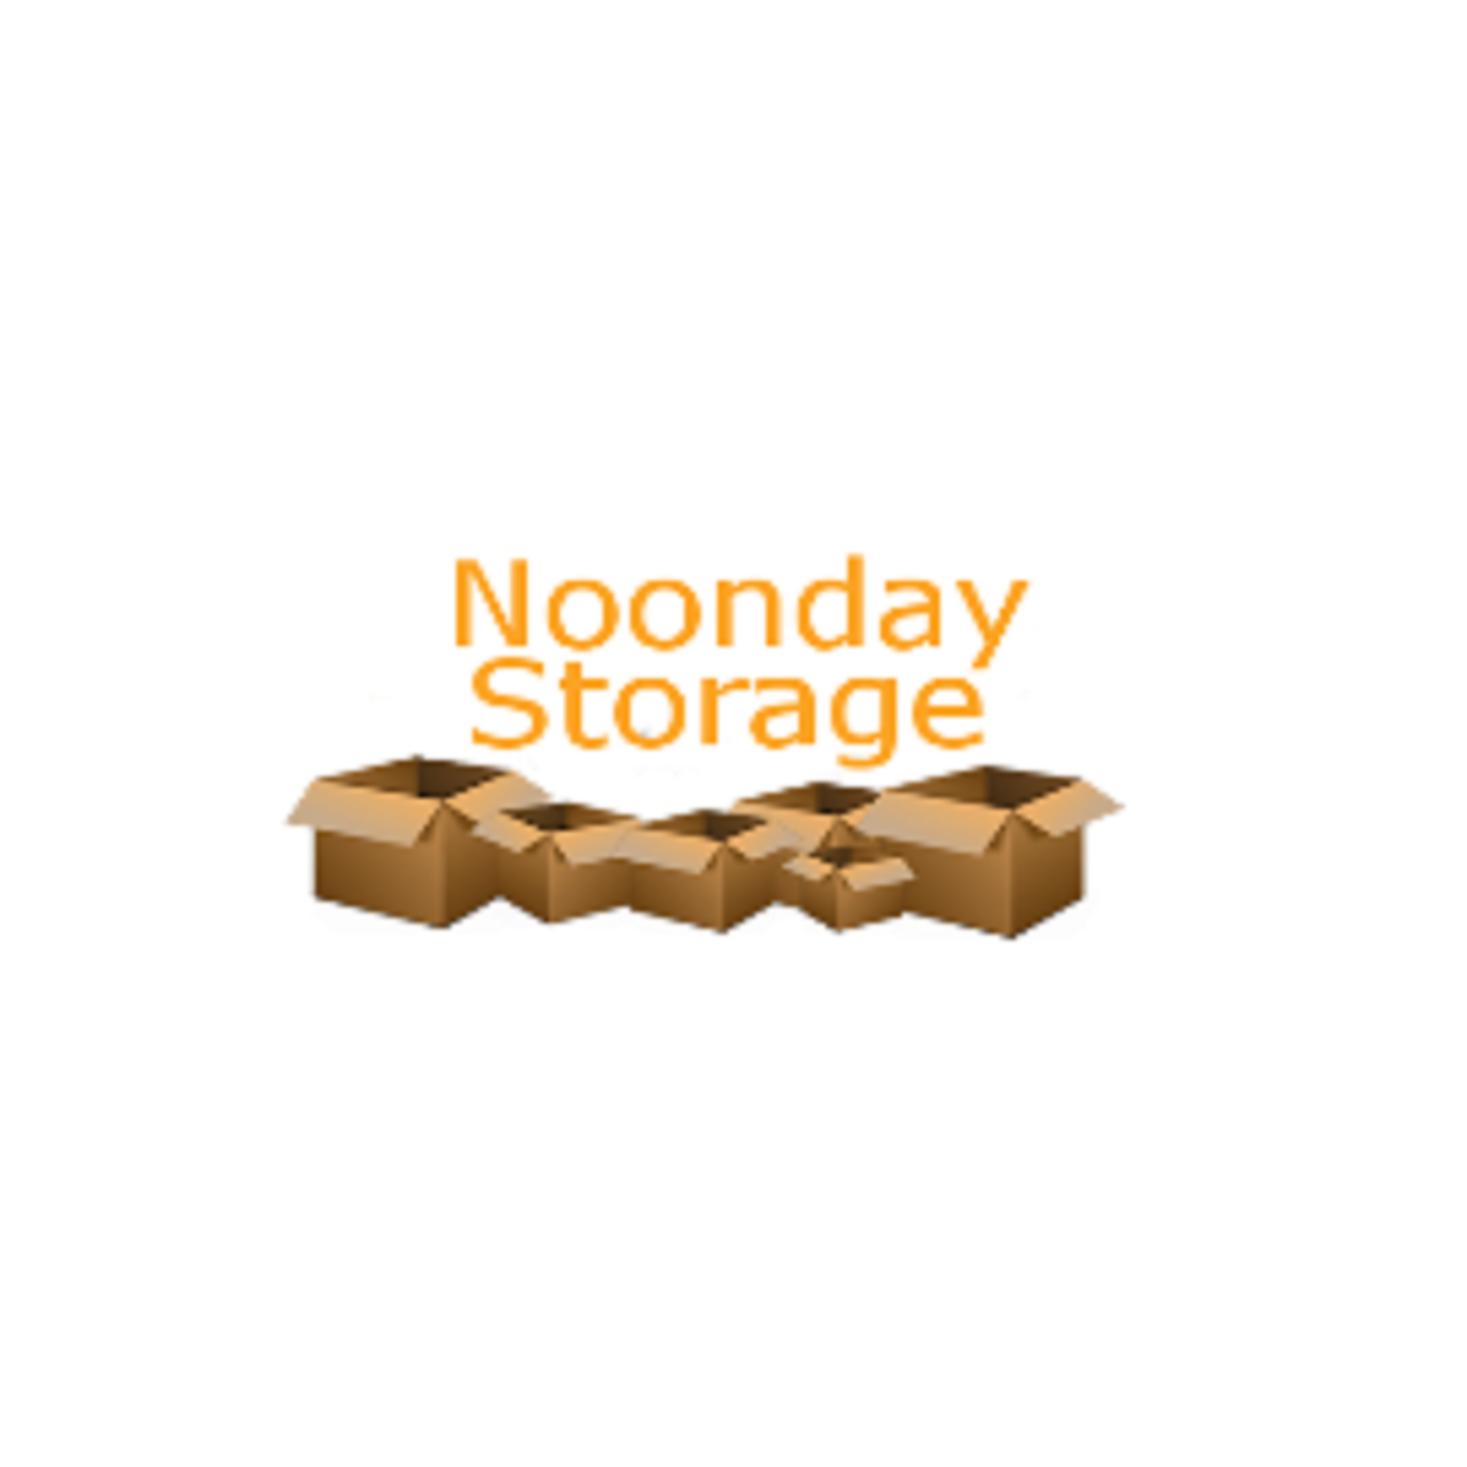 Noonday Storage image 2